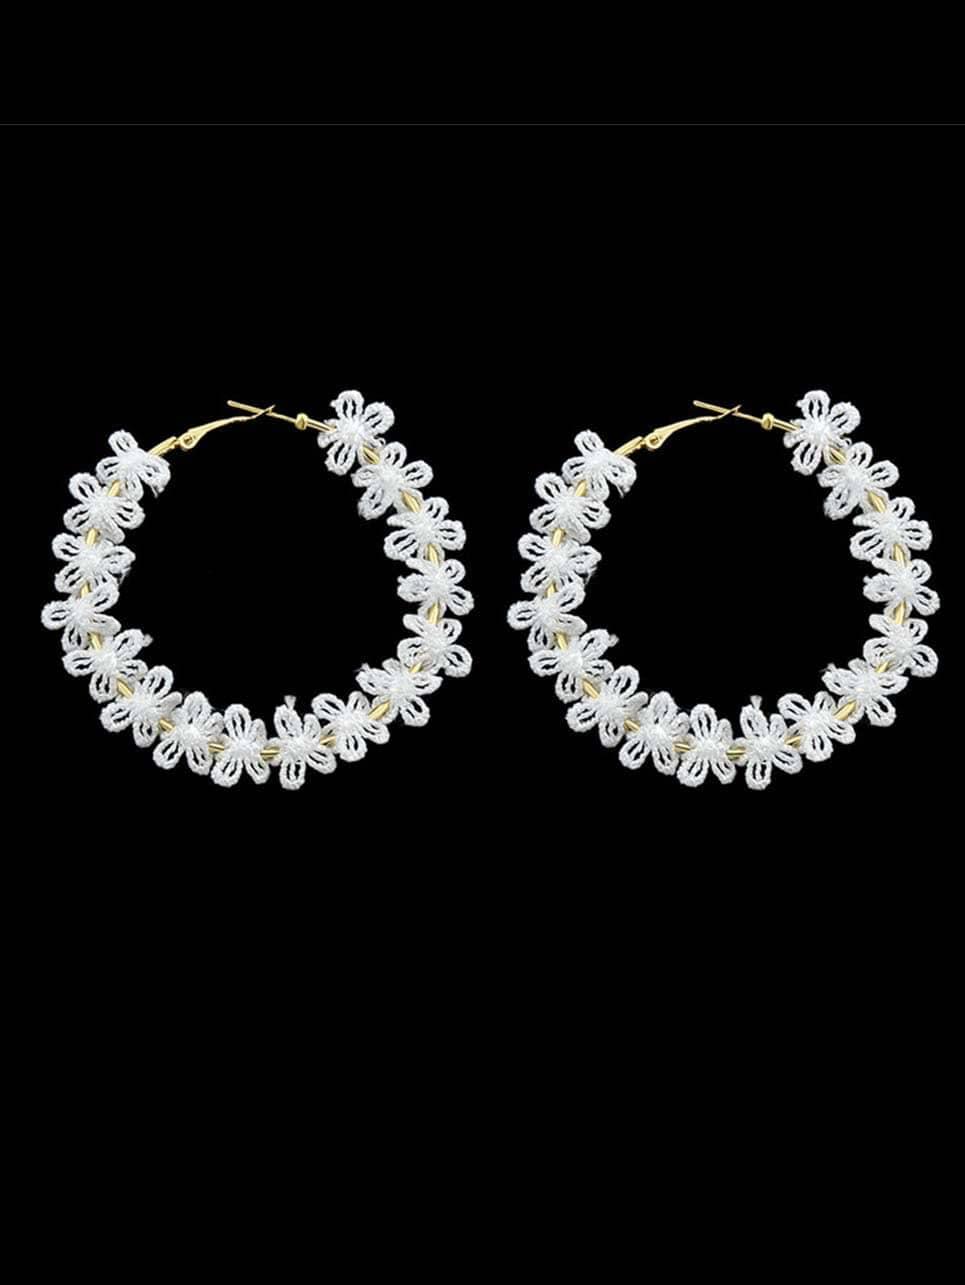 Fashion White Lace Flower Small Hoop Earrings